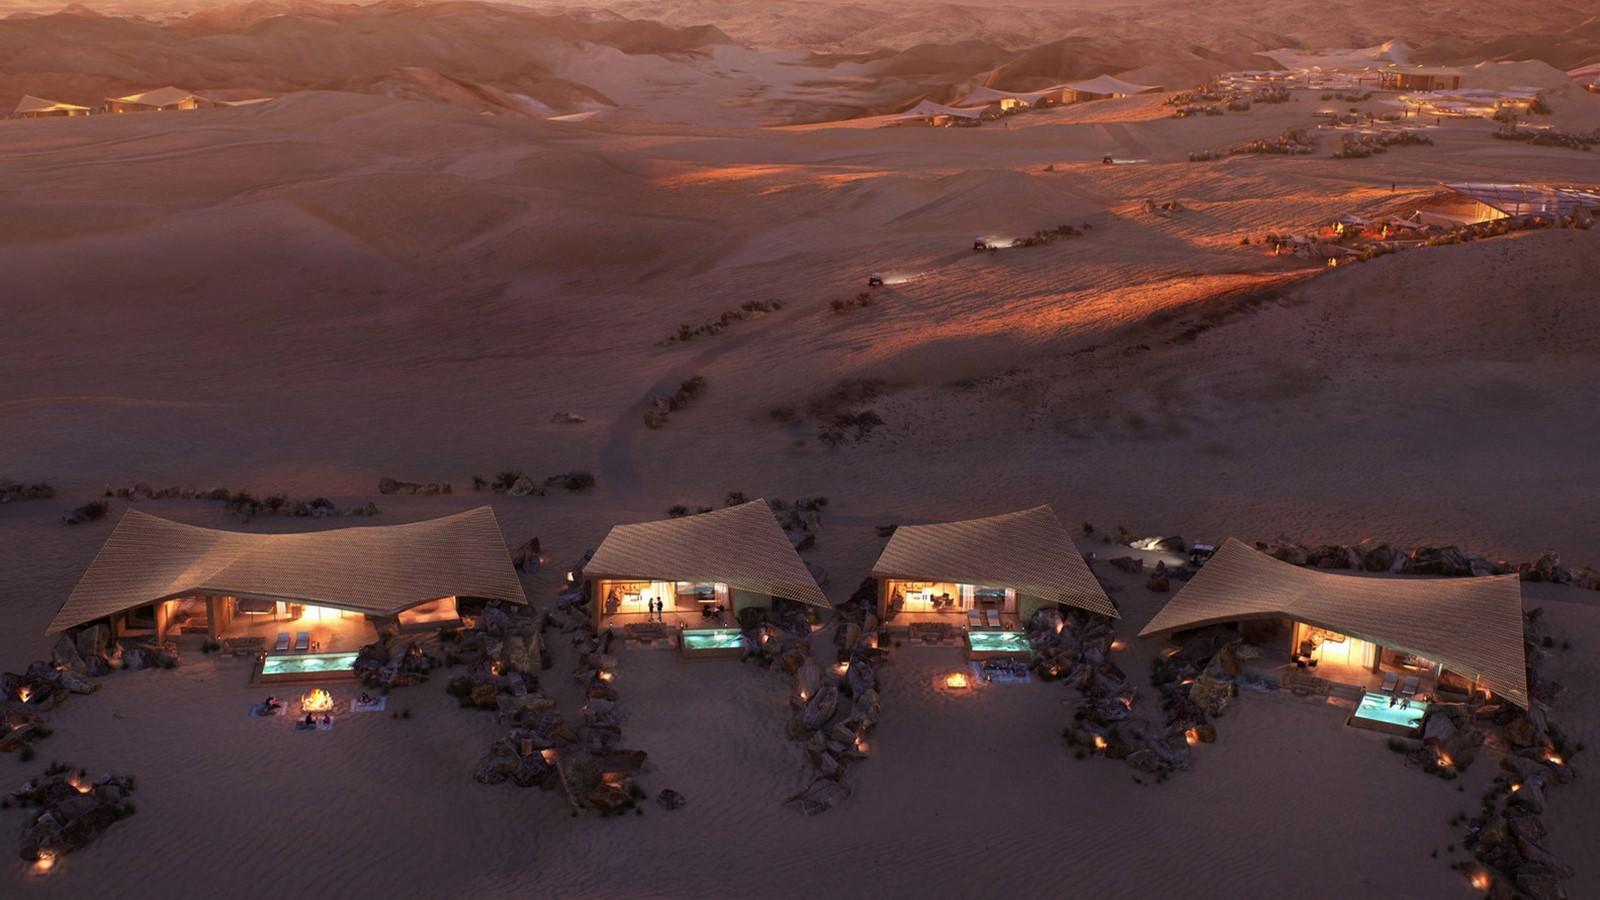 Saudi Arabian Hotel in Sand Dunes designed by Foster + Partners - Sheet2